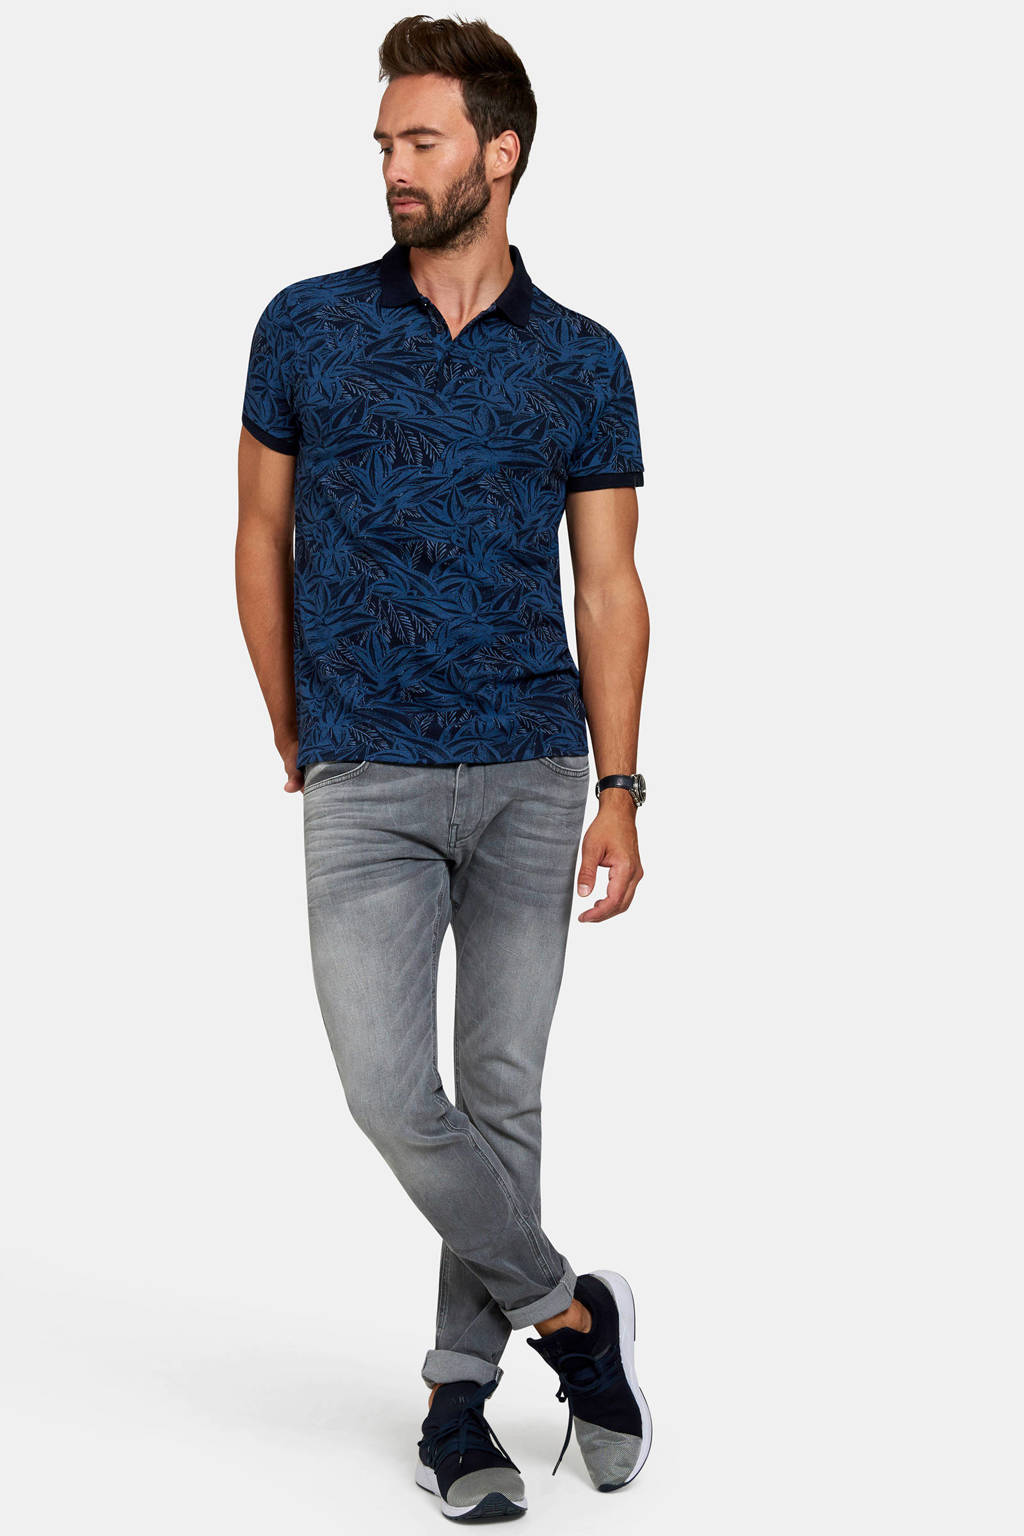 Refill regular fit polo met all over print donkerblauw, Donkerblauw/zwart